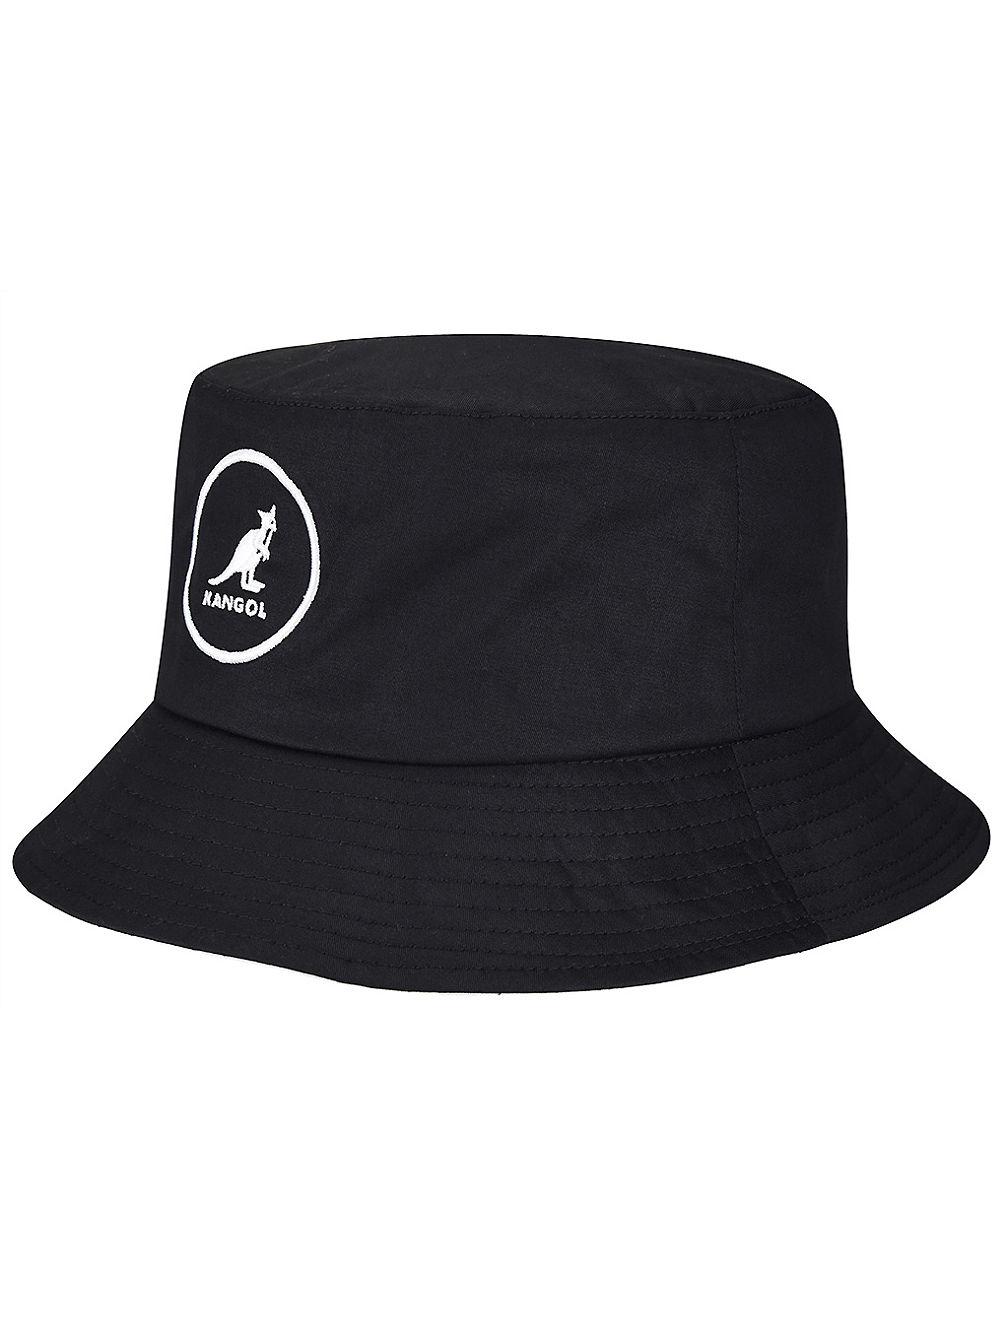 Buy Kangol Cotton Bucket Hat online at blue-tomato.com e6b8b51deac